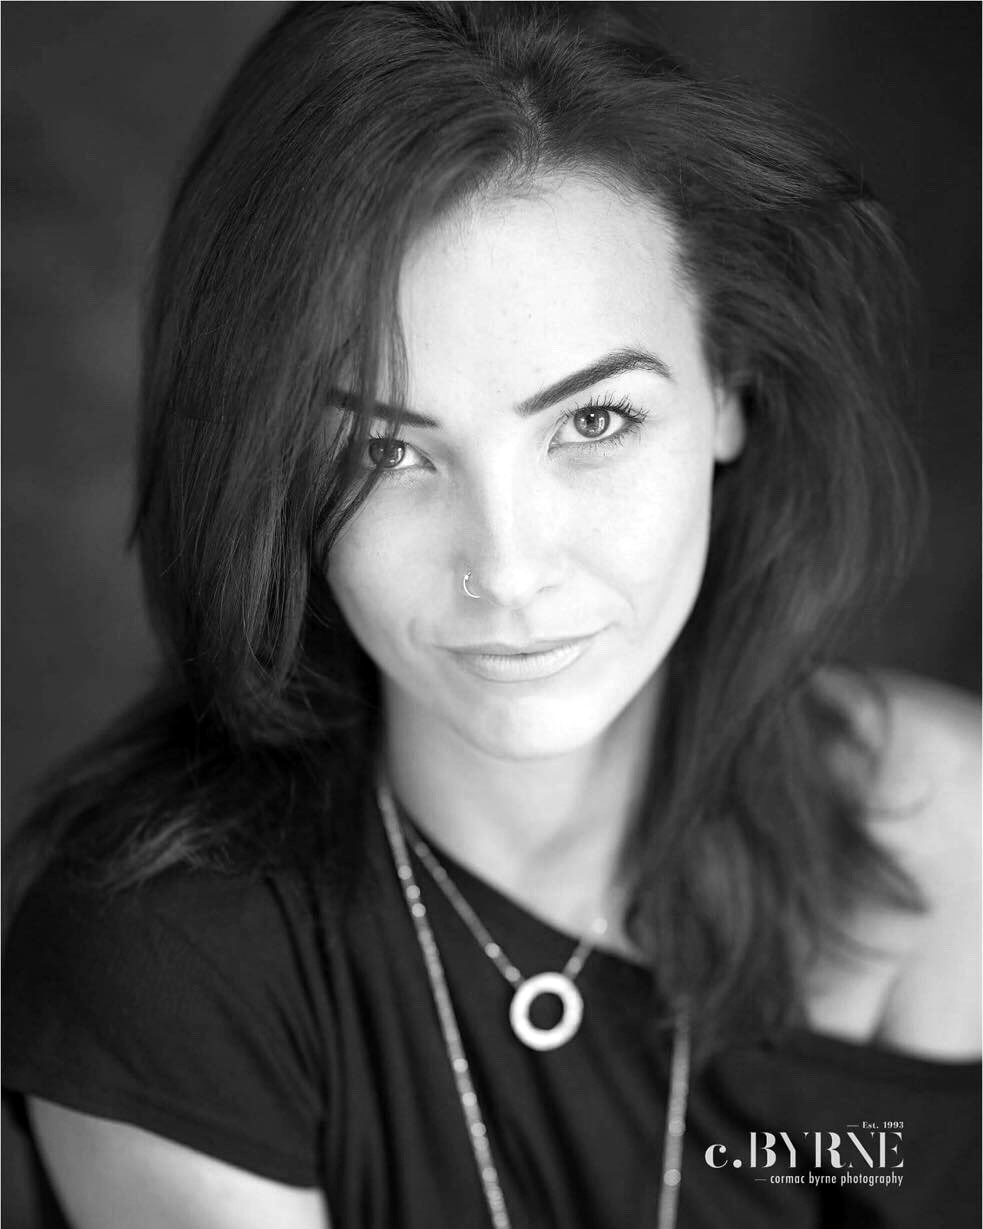 Nicola Bennett Playing Age: 20-30